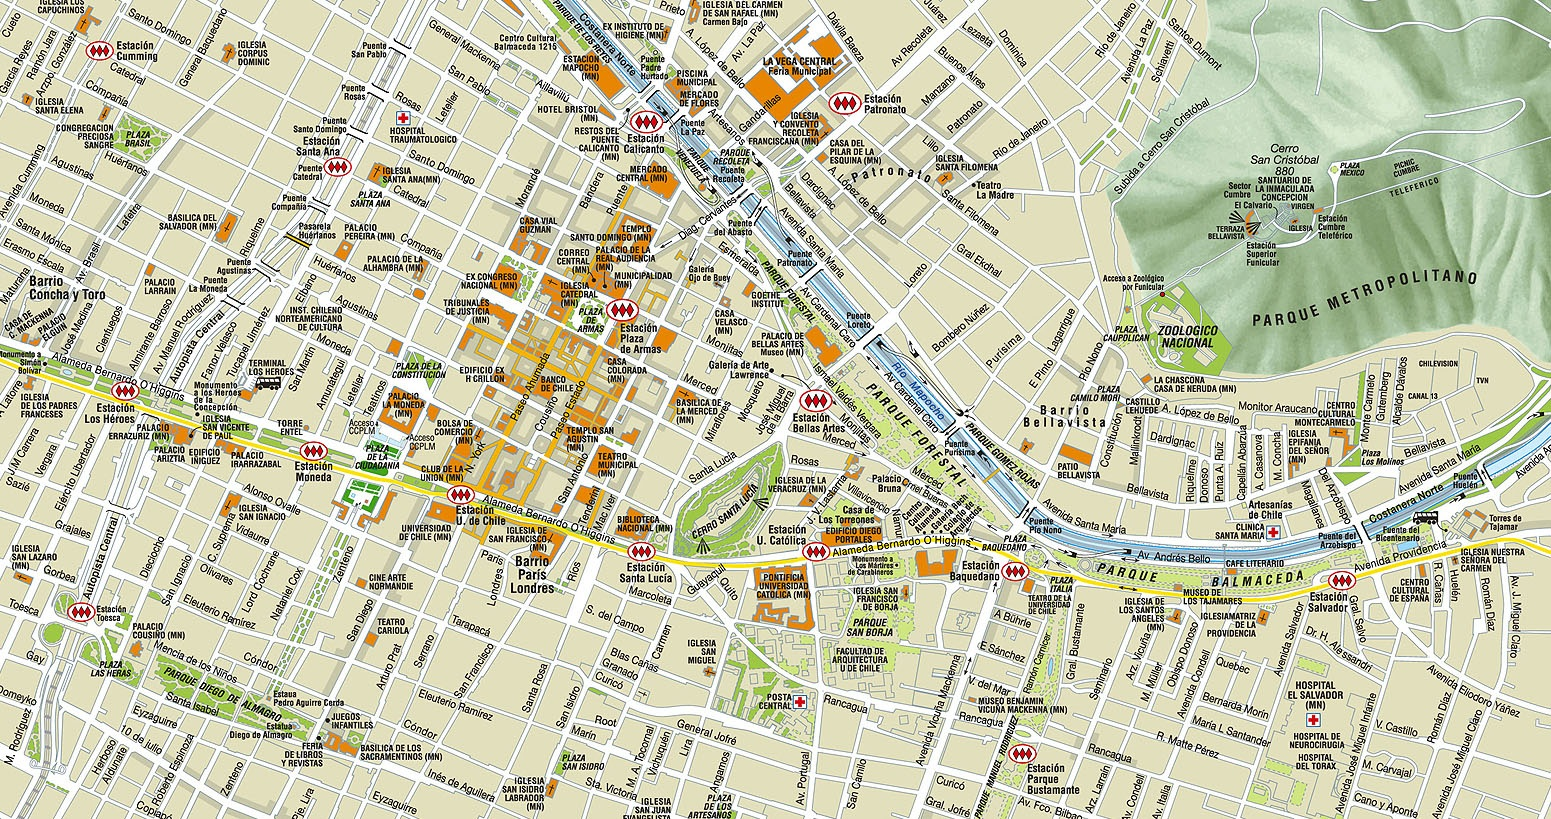 chile lel agora em berlim mapa santiago